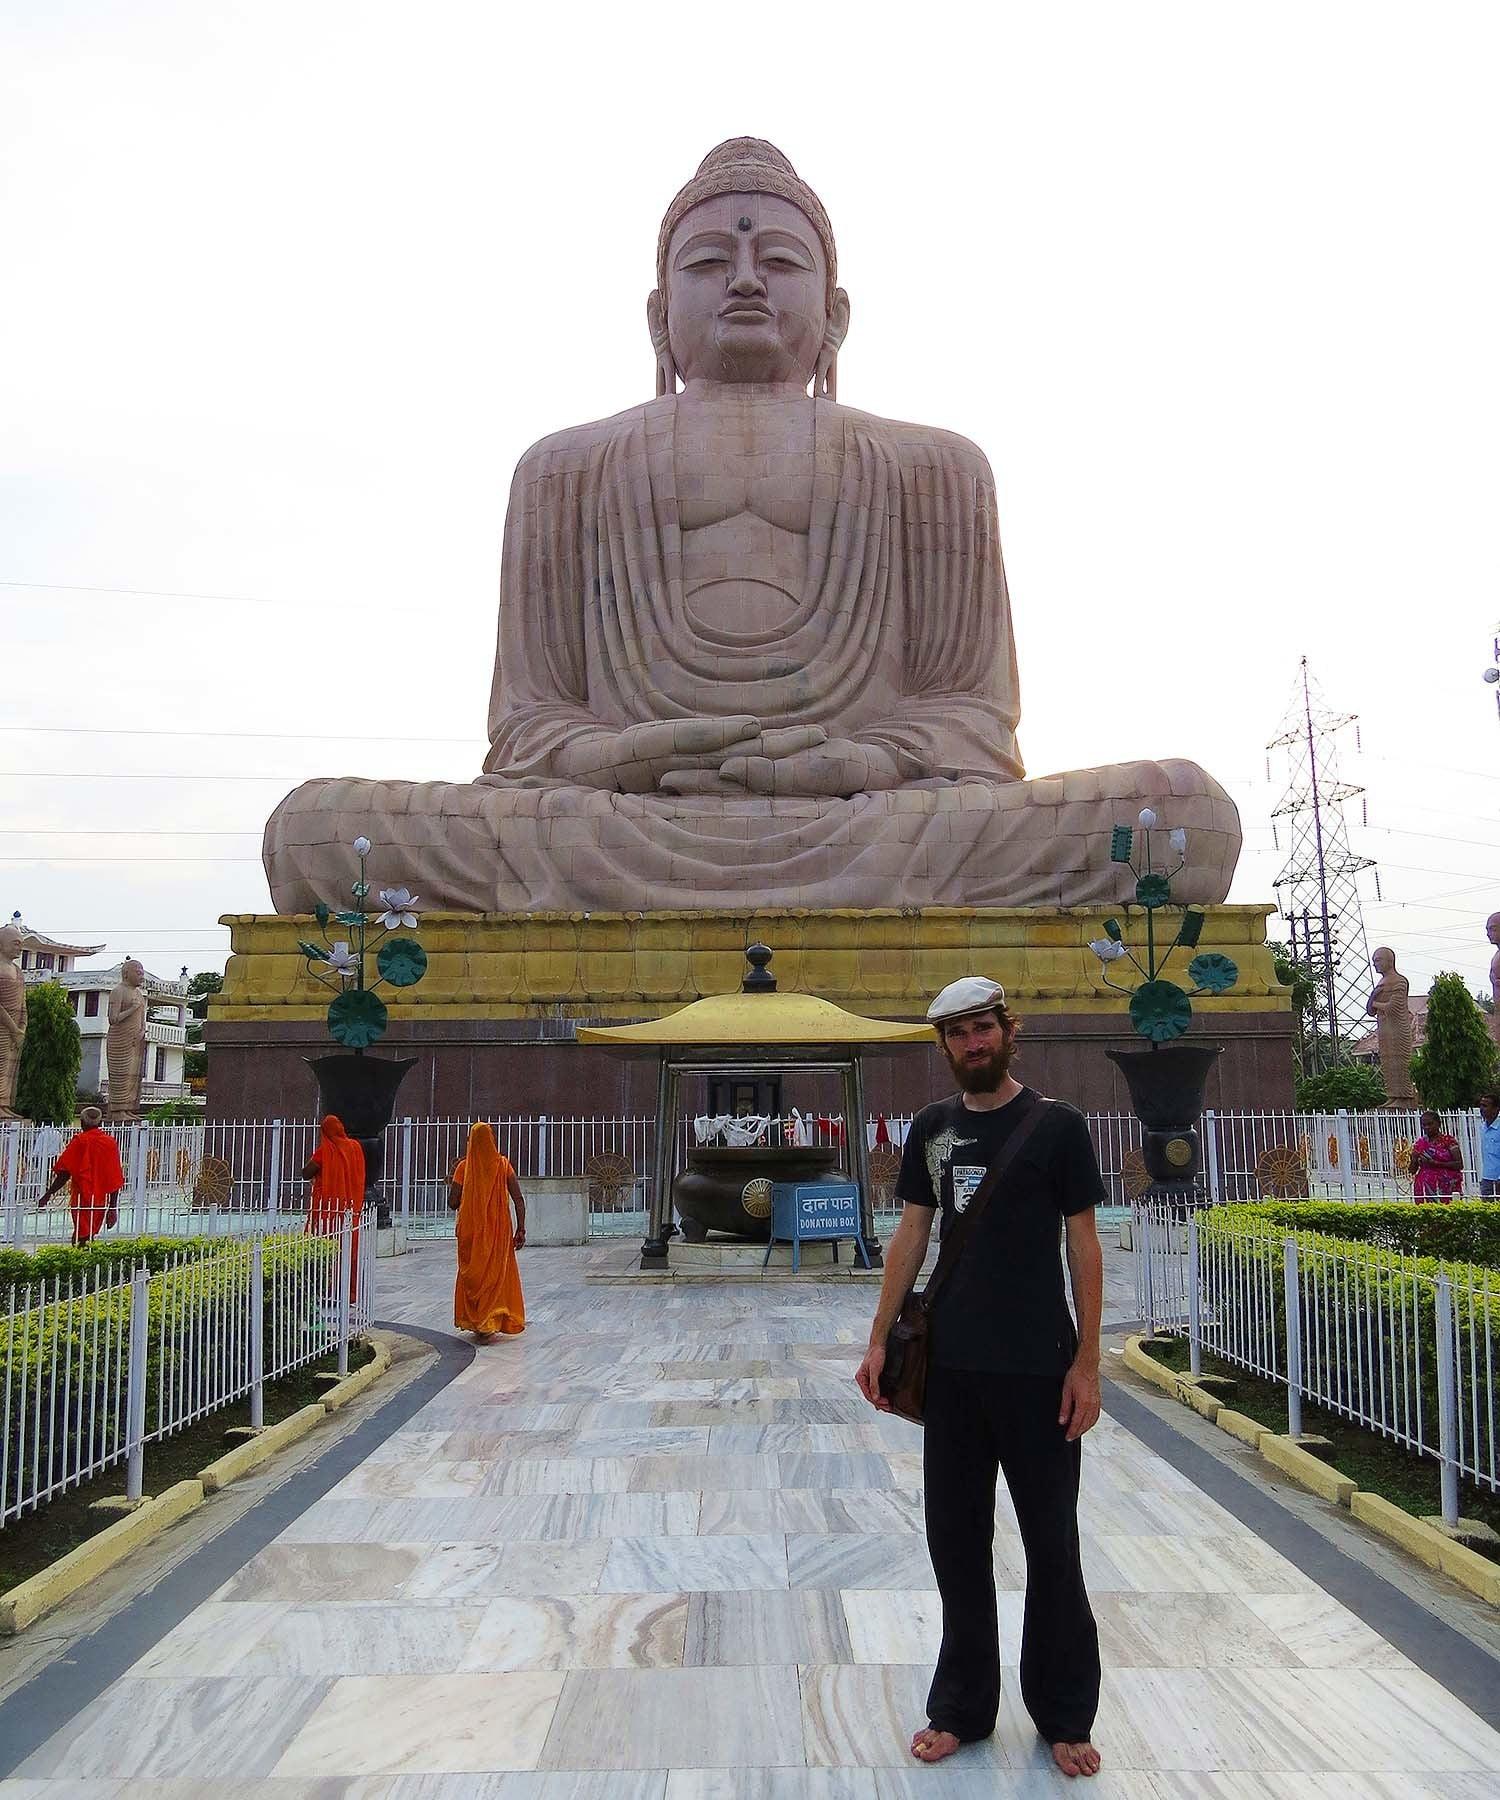 A Buddha statue in Bodhgaya.